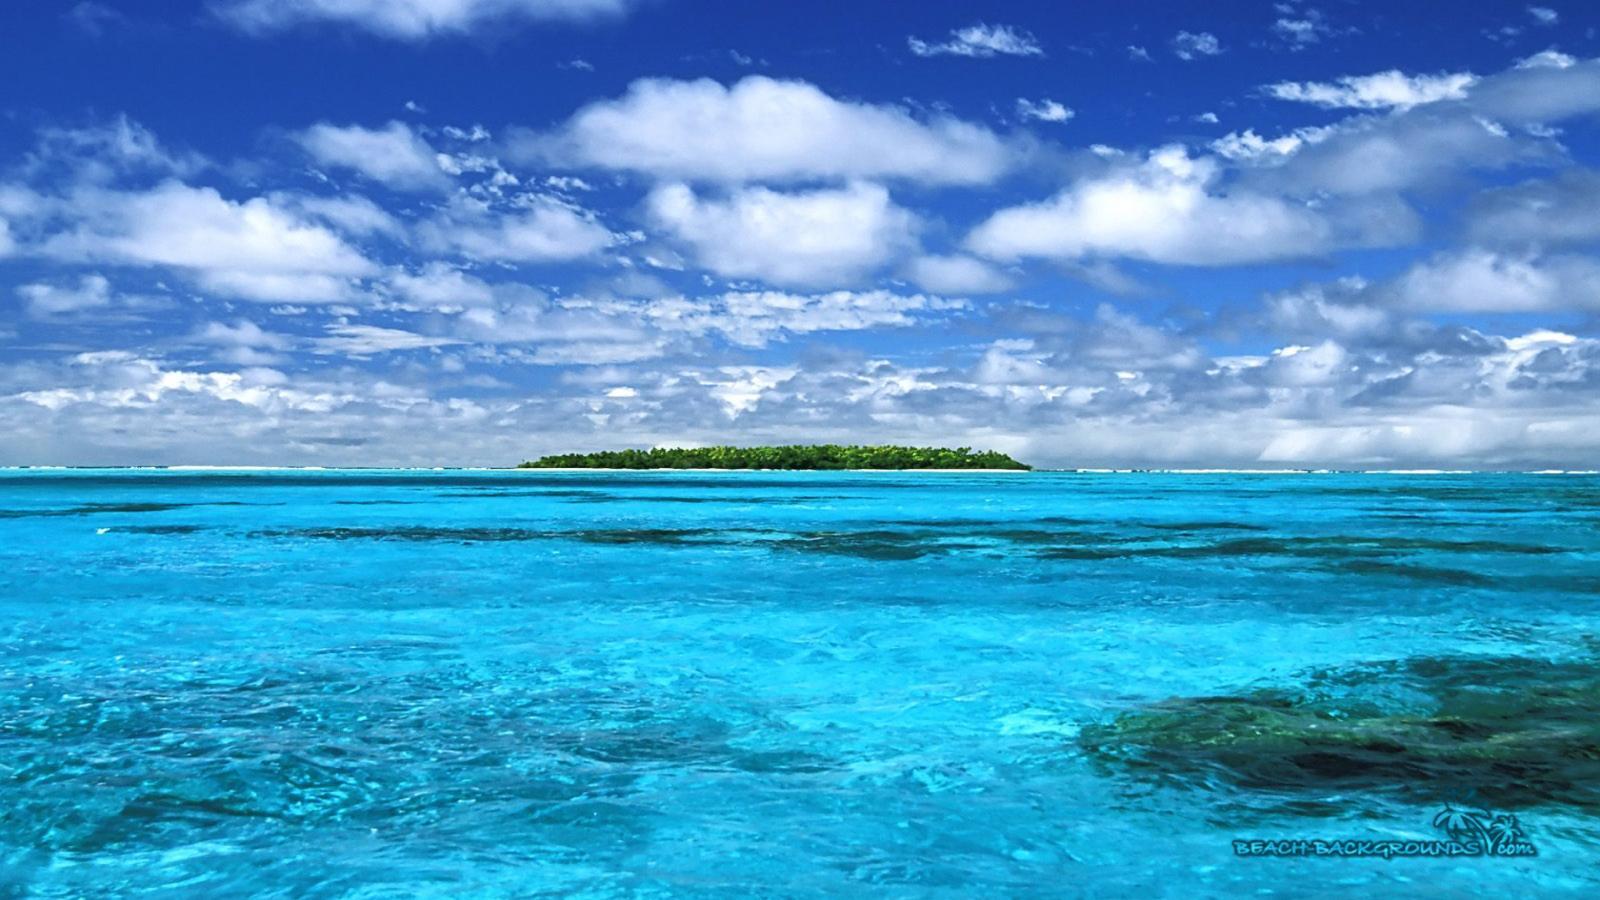 For Desktop HD Wallpapers 1600x900 Beach Wallpapers 1600x900 Download 1600x900